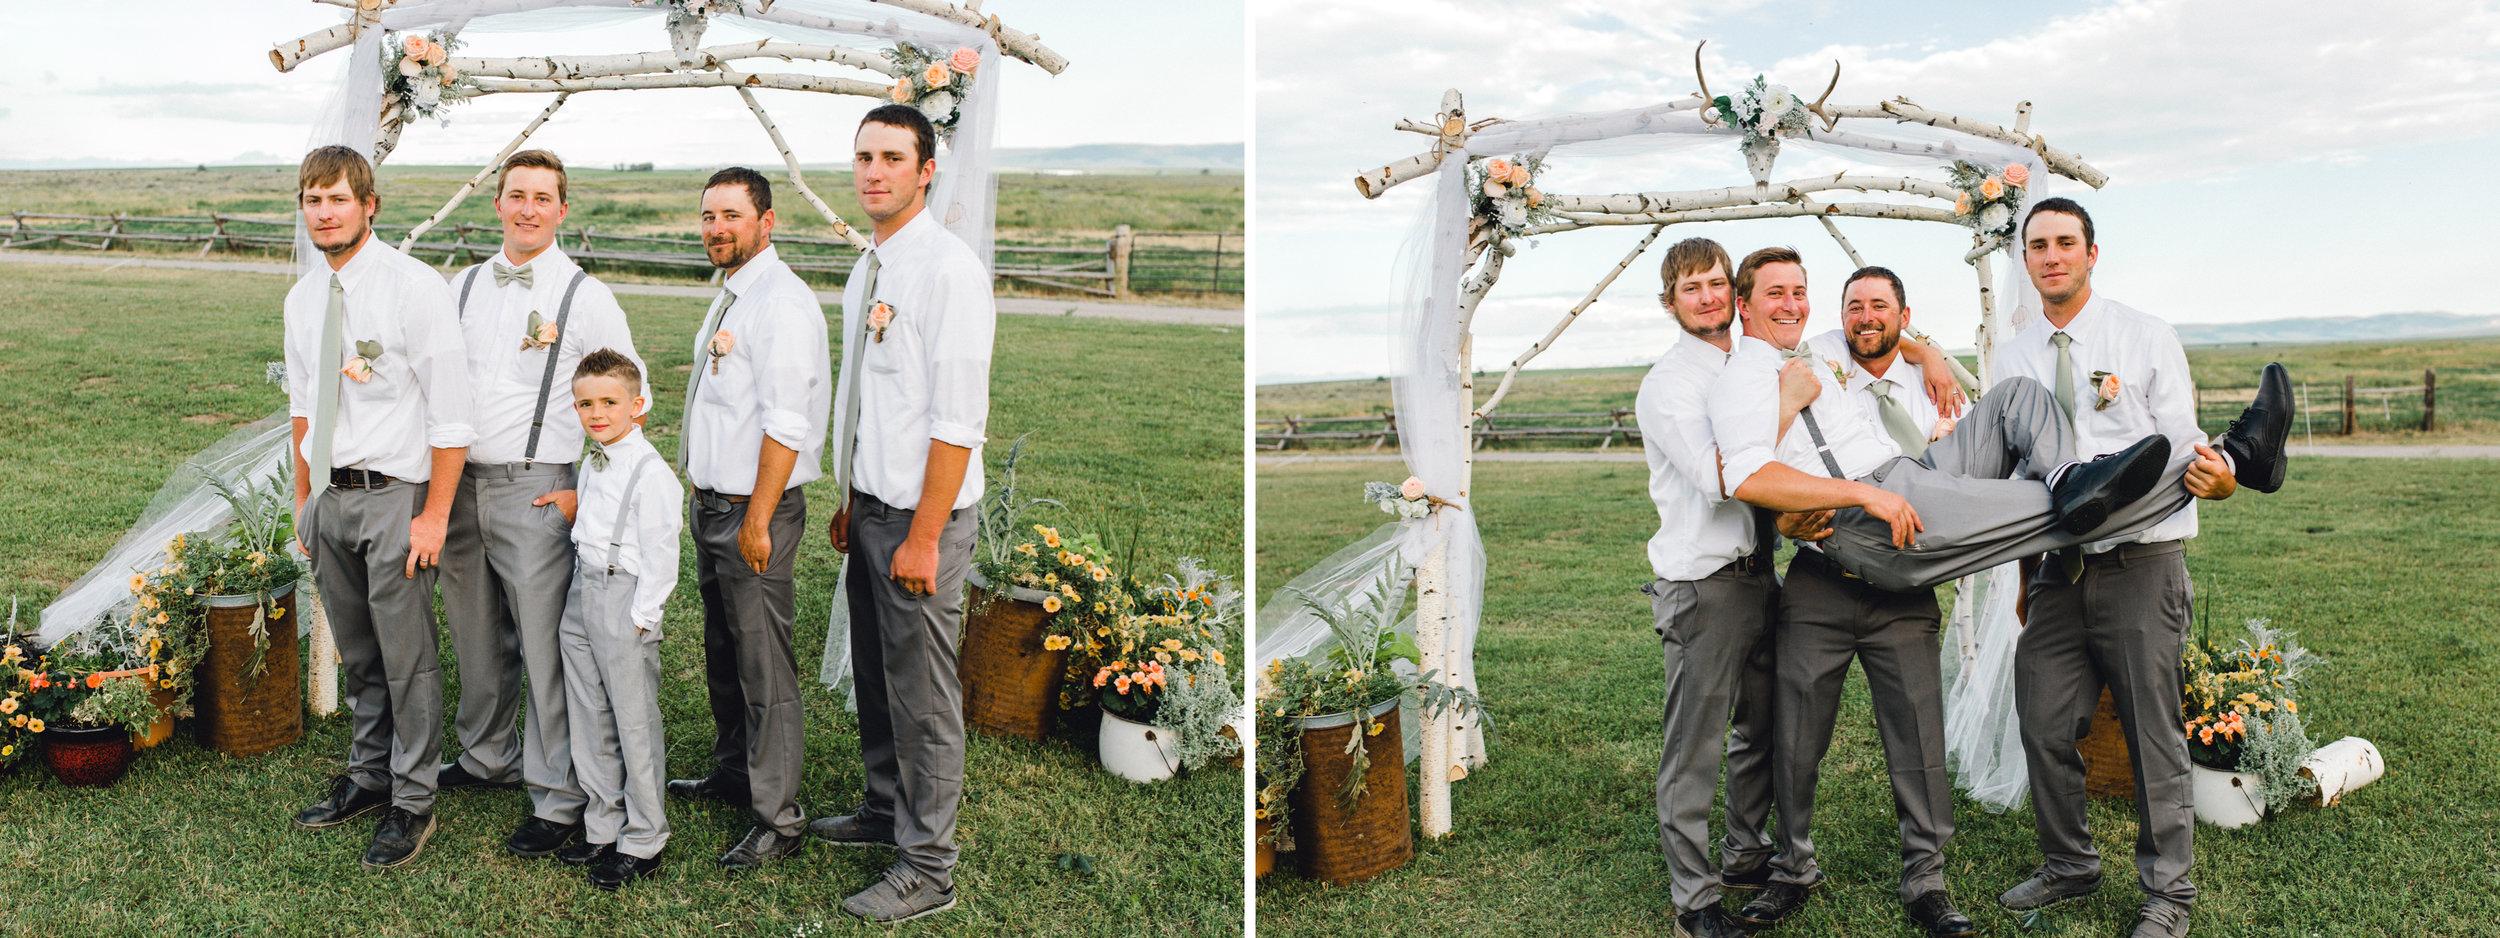 country-outdoor-rustic-wedding-tetons-idaho-anna-christine-photo-7.jpg